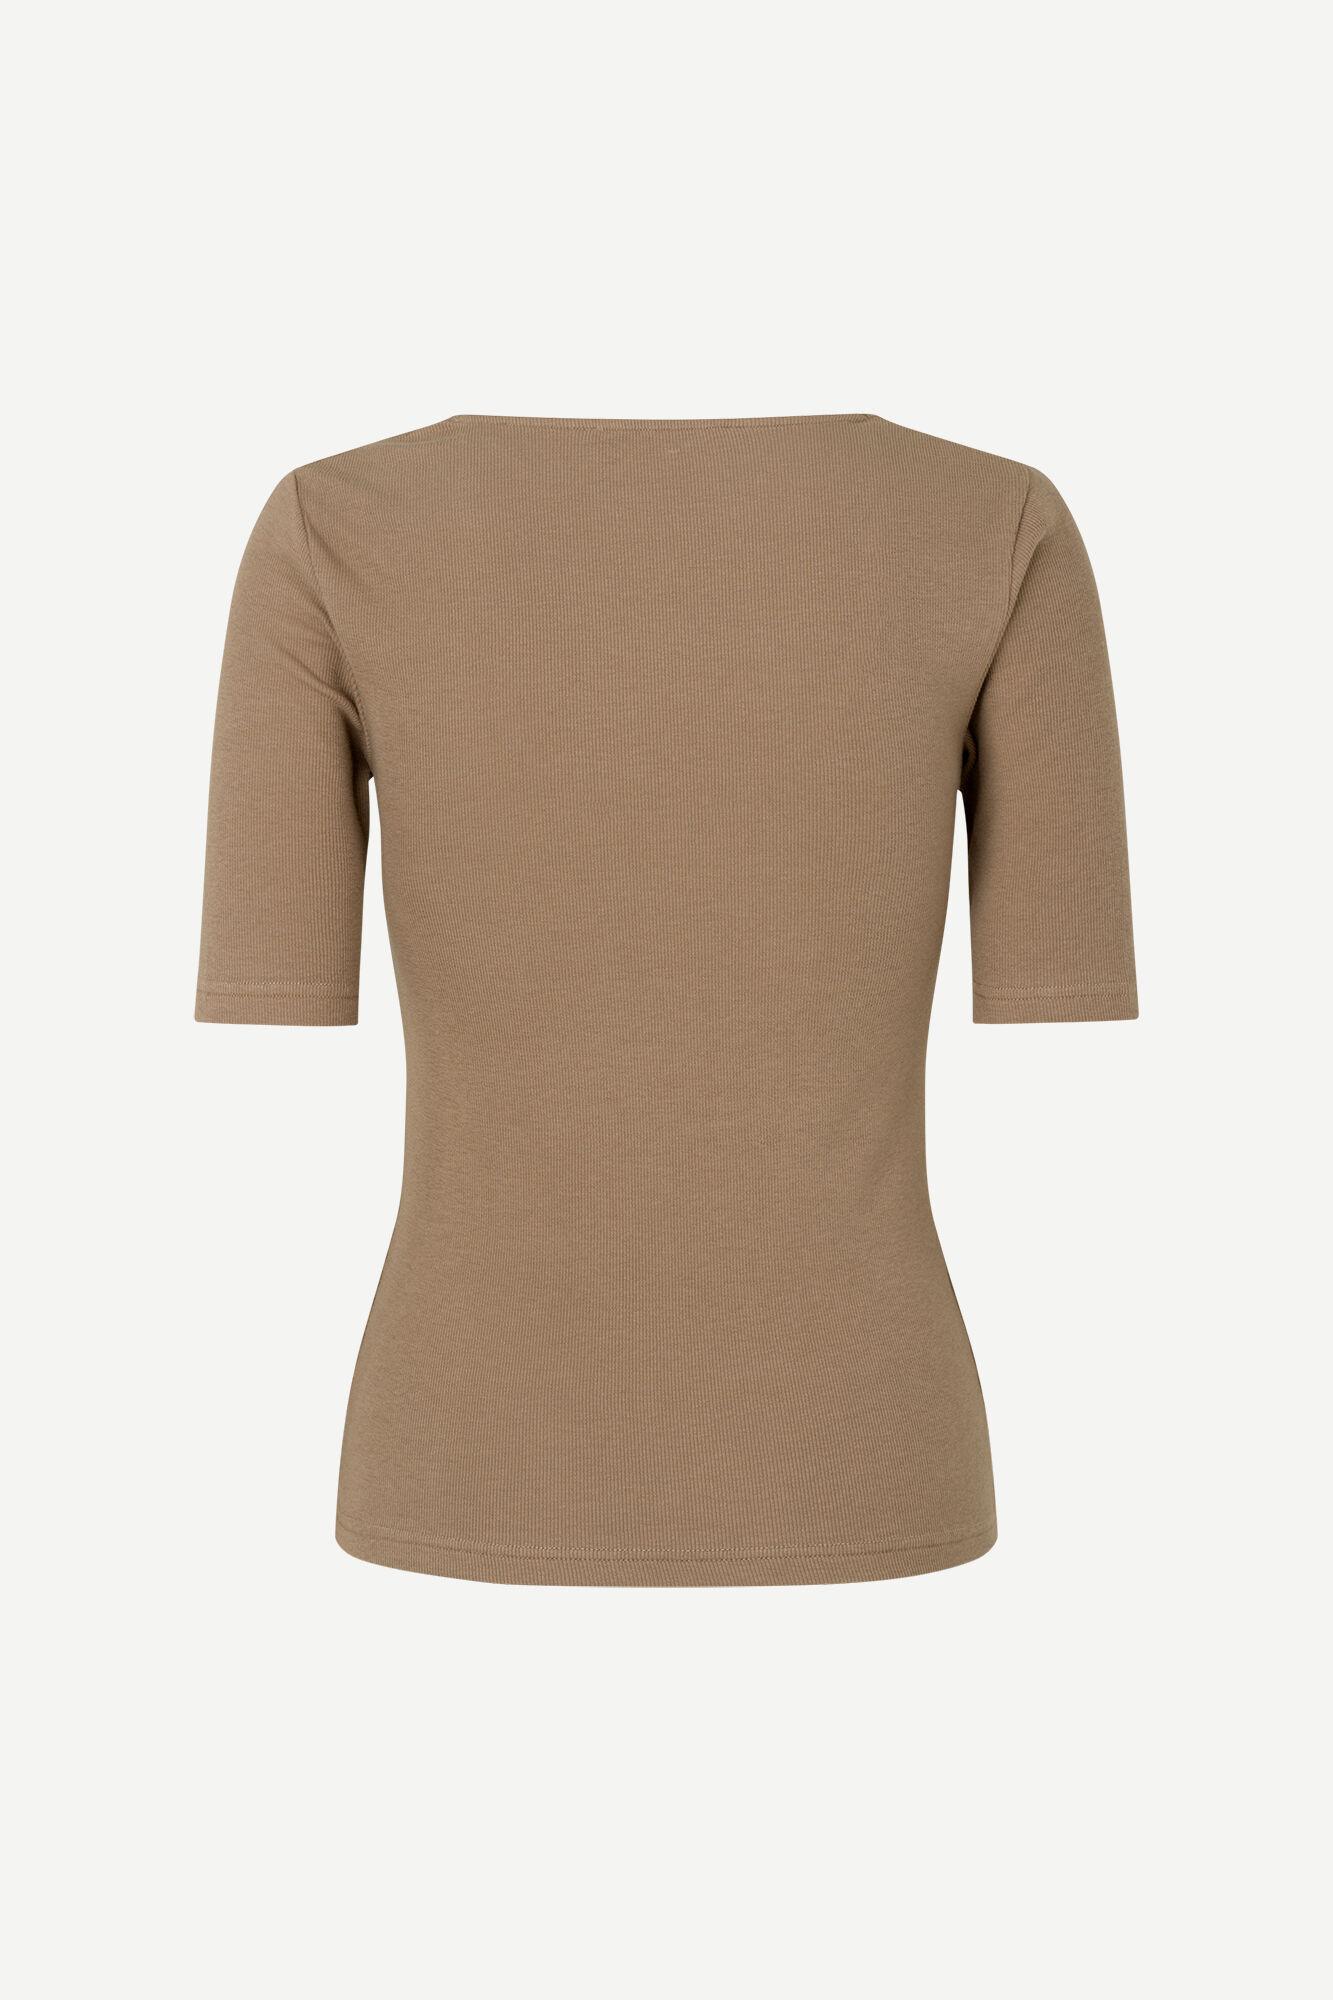 Alexo ss t-shirt 7542, CARIBOU